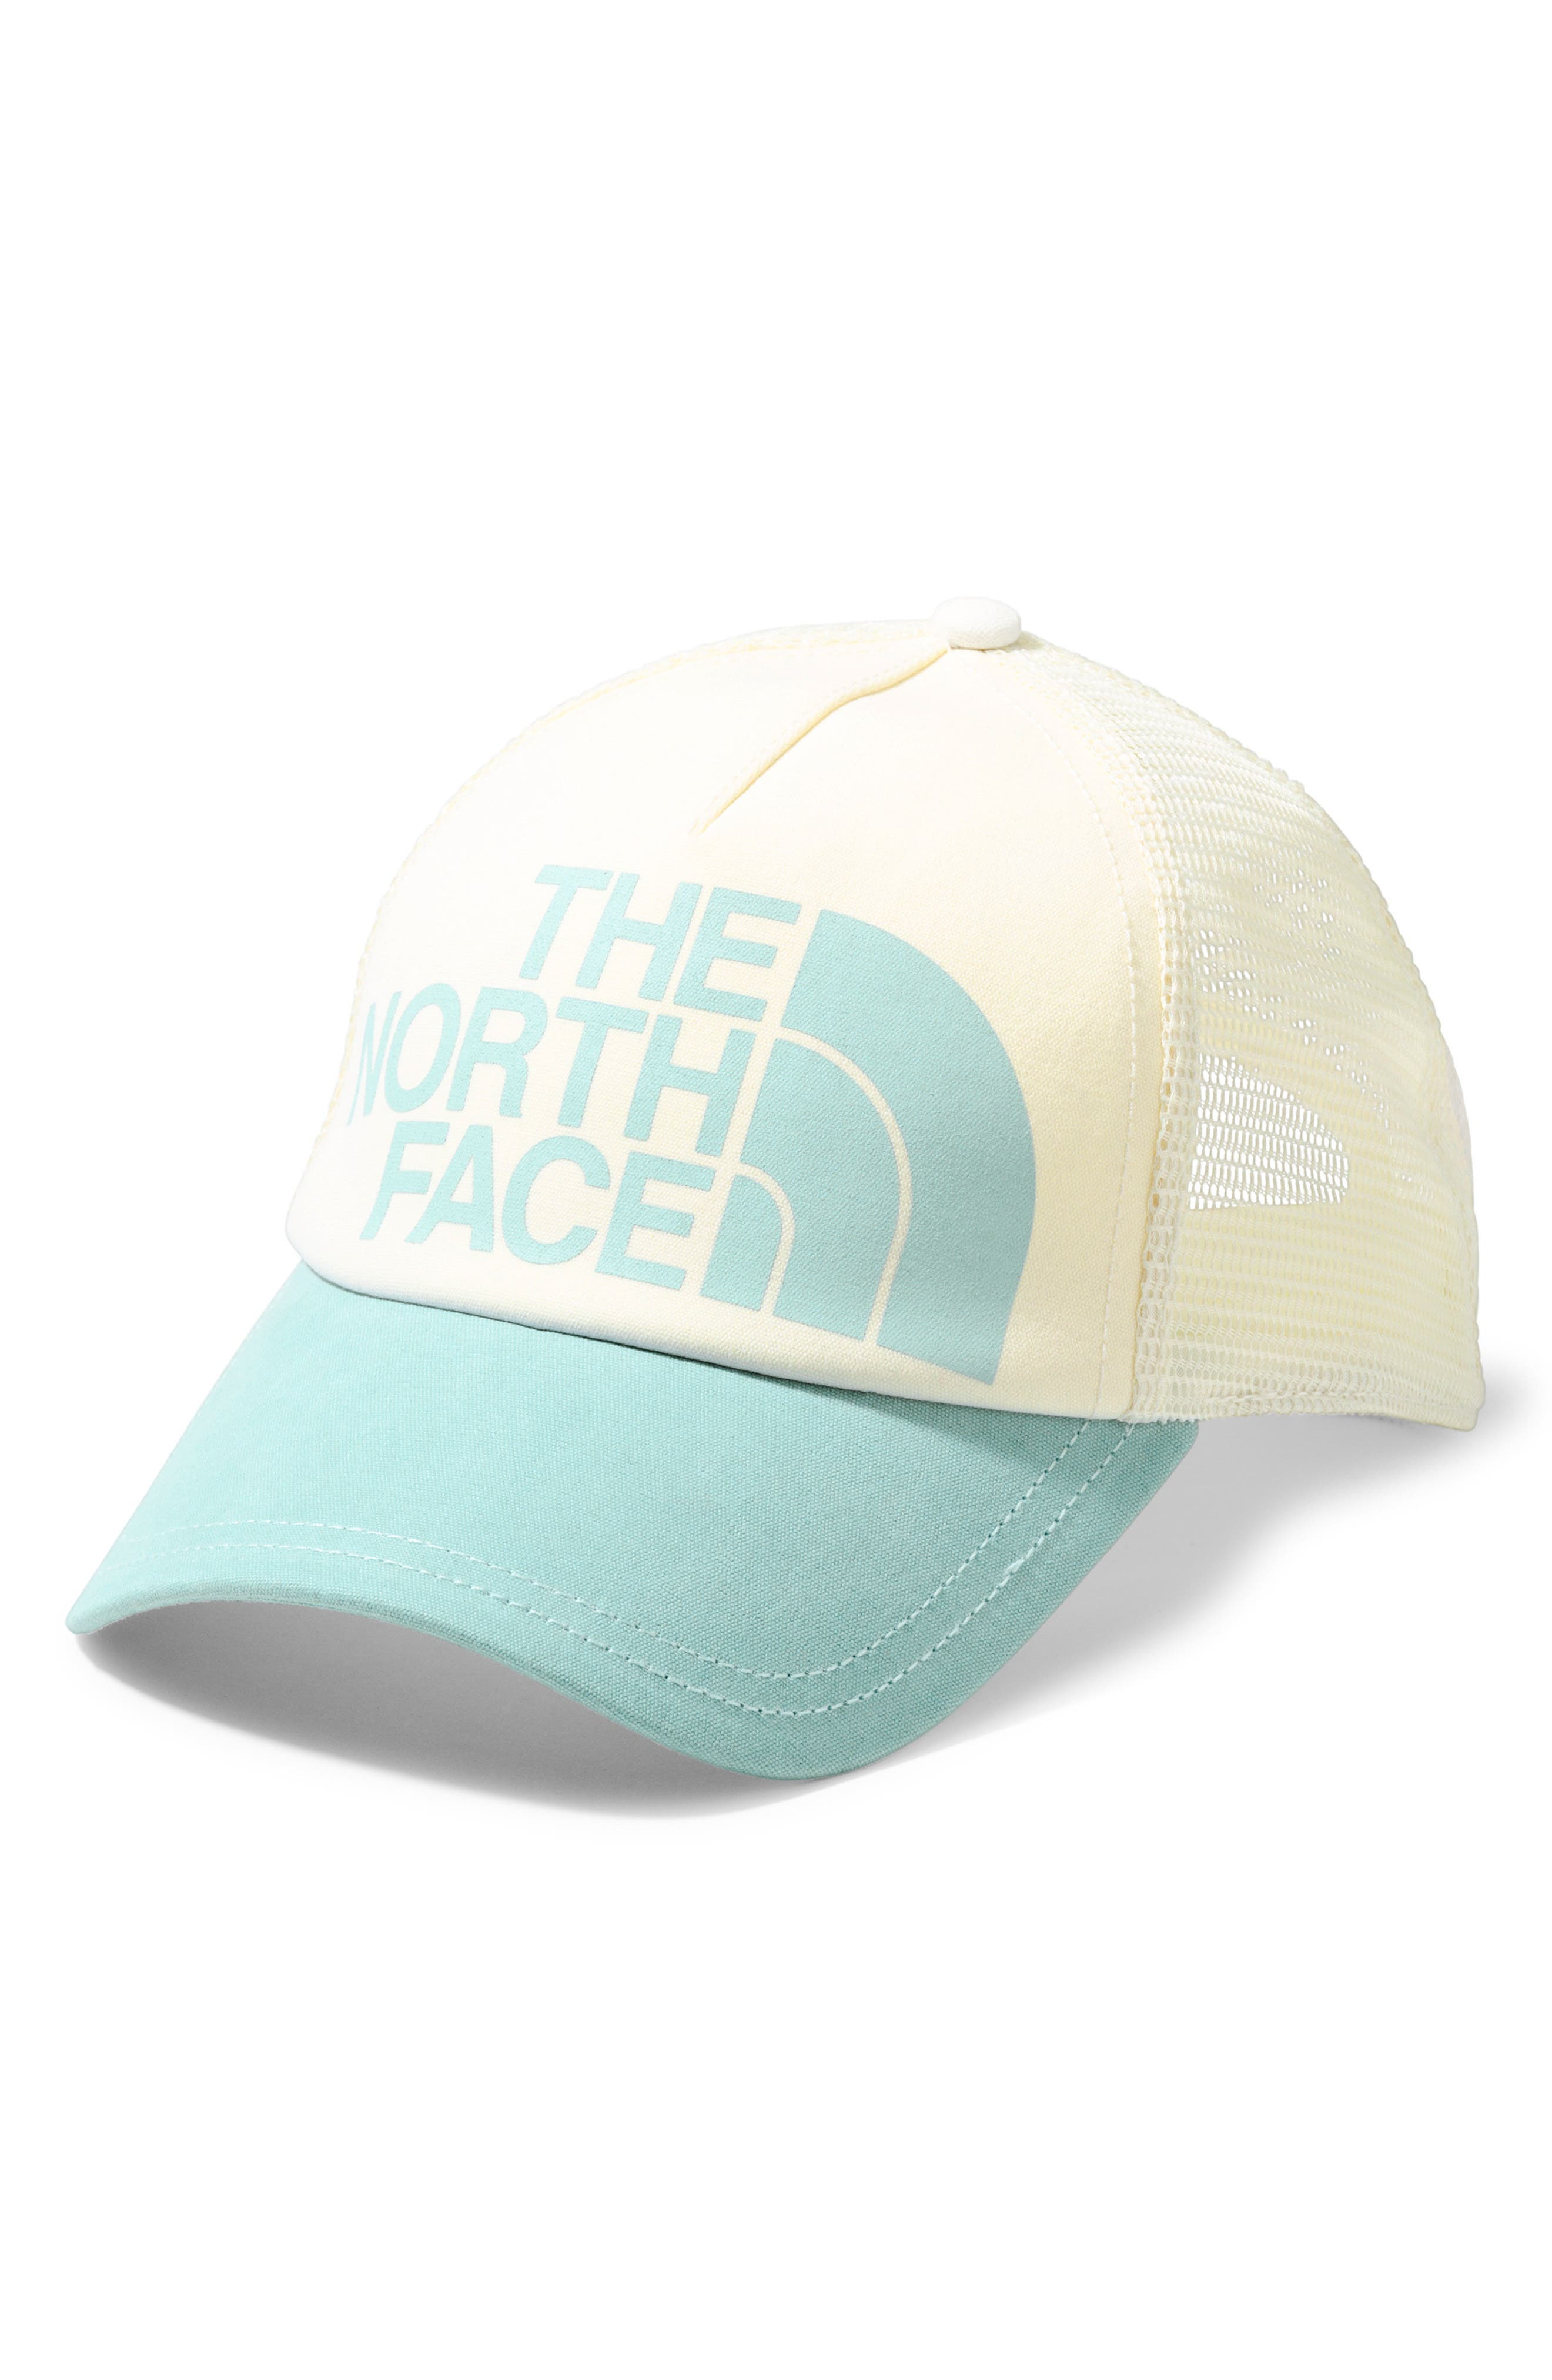 da6c914137e66c Women's Hats New Arrivals: Clothing, Shoes & Beauty | Nordstrom